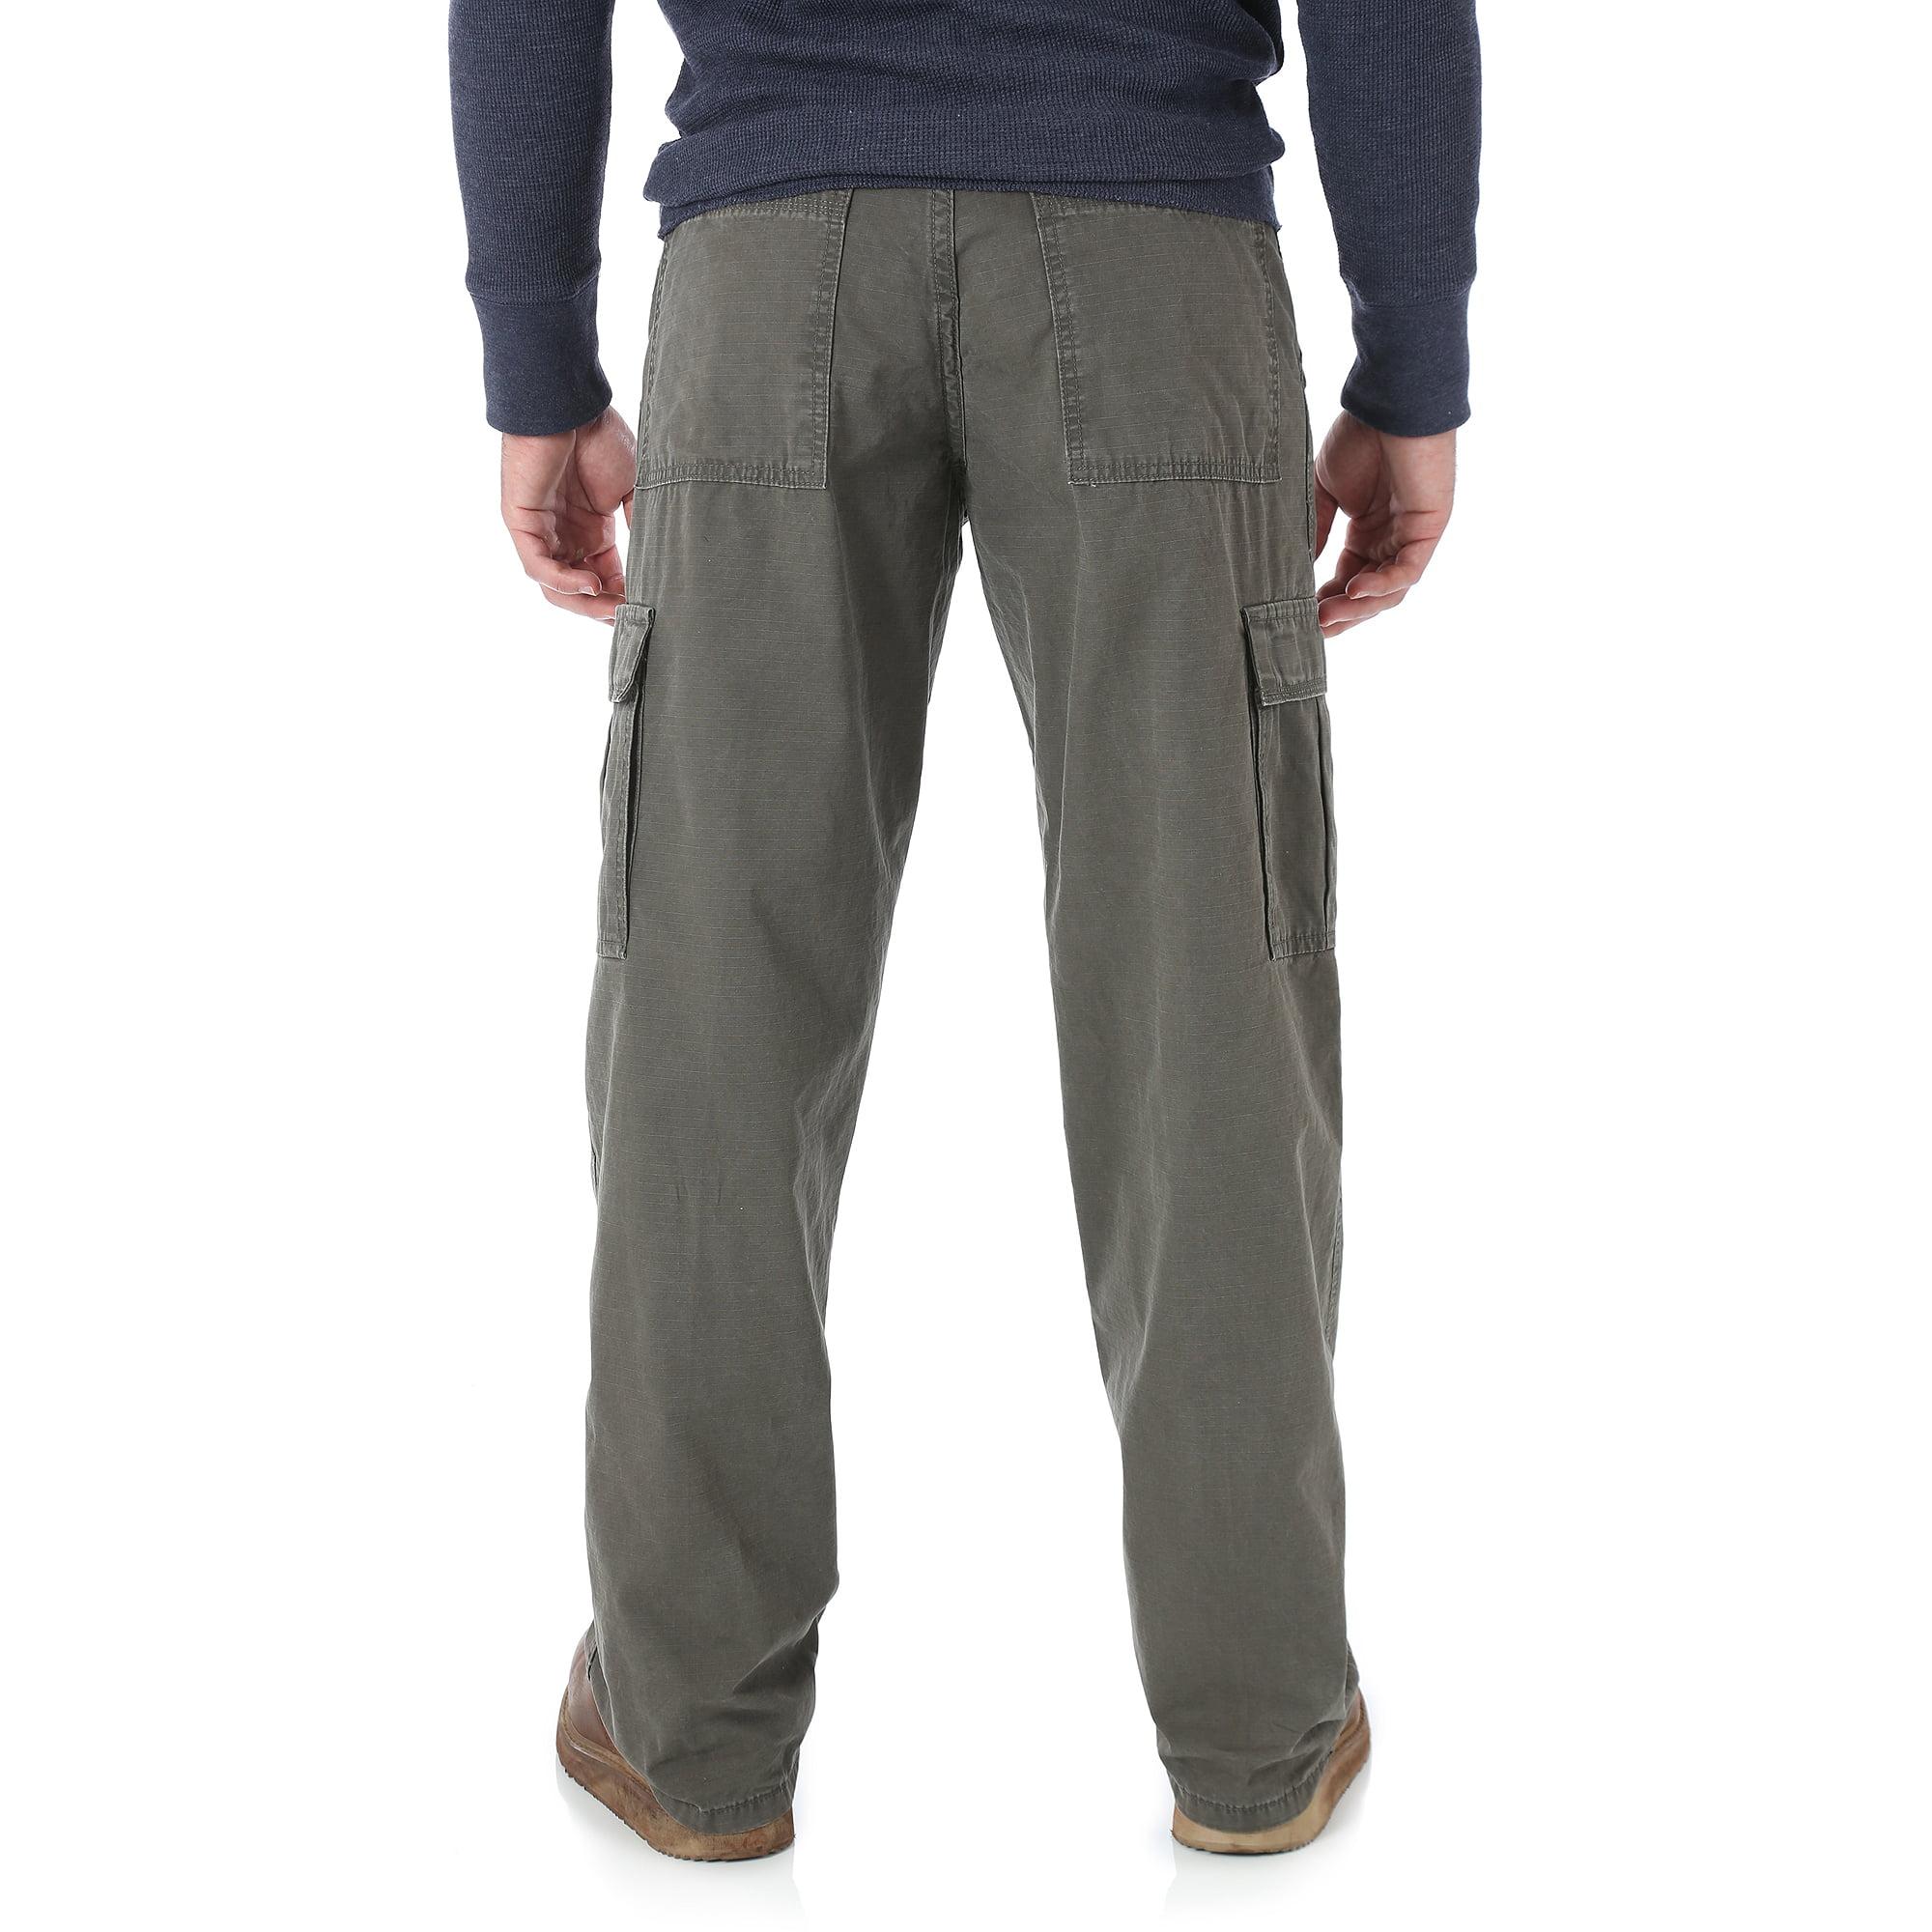 Wrangler - Big Men's Rip-Stop Cargo Pants